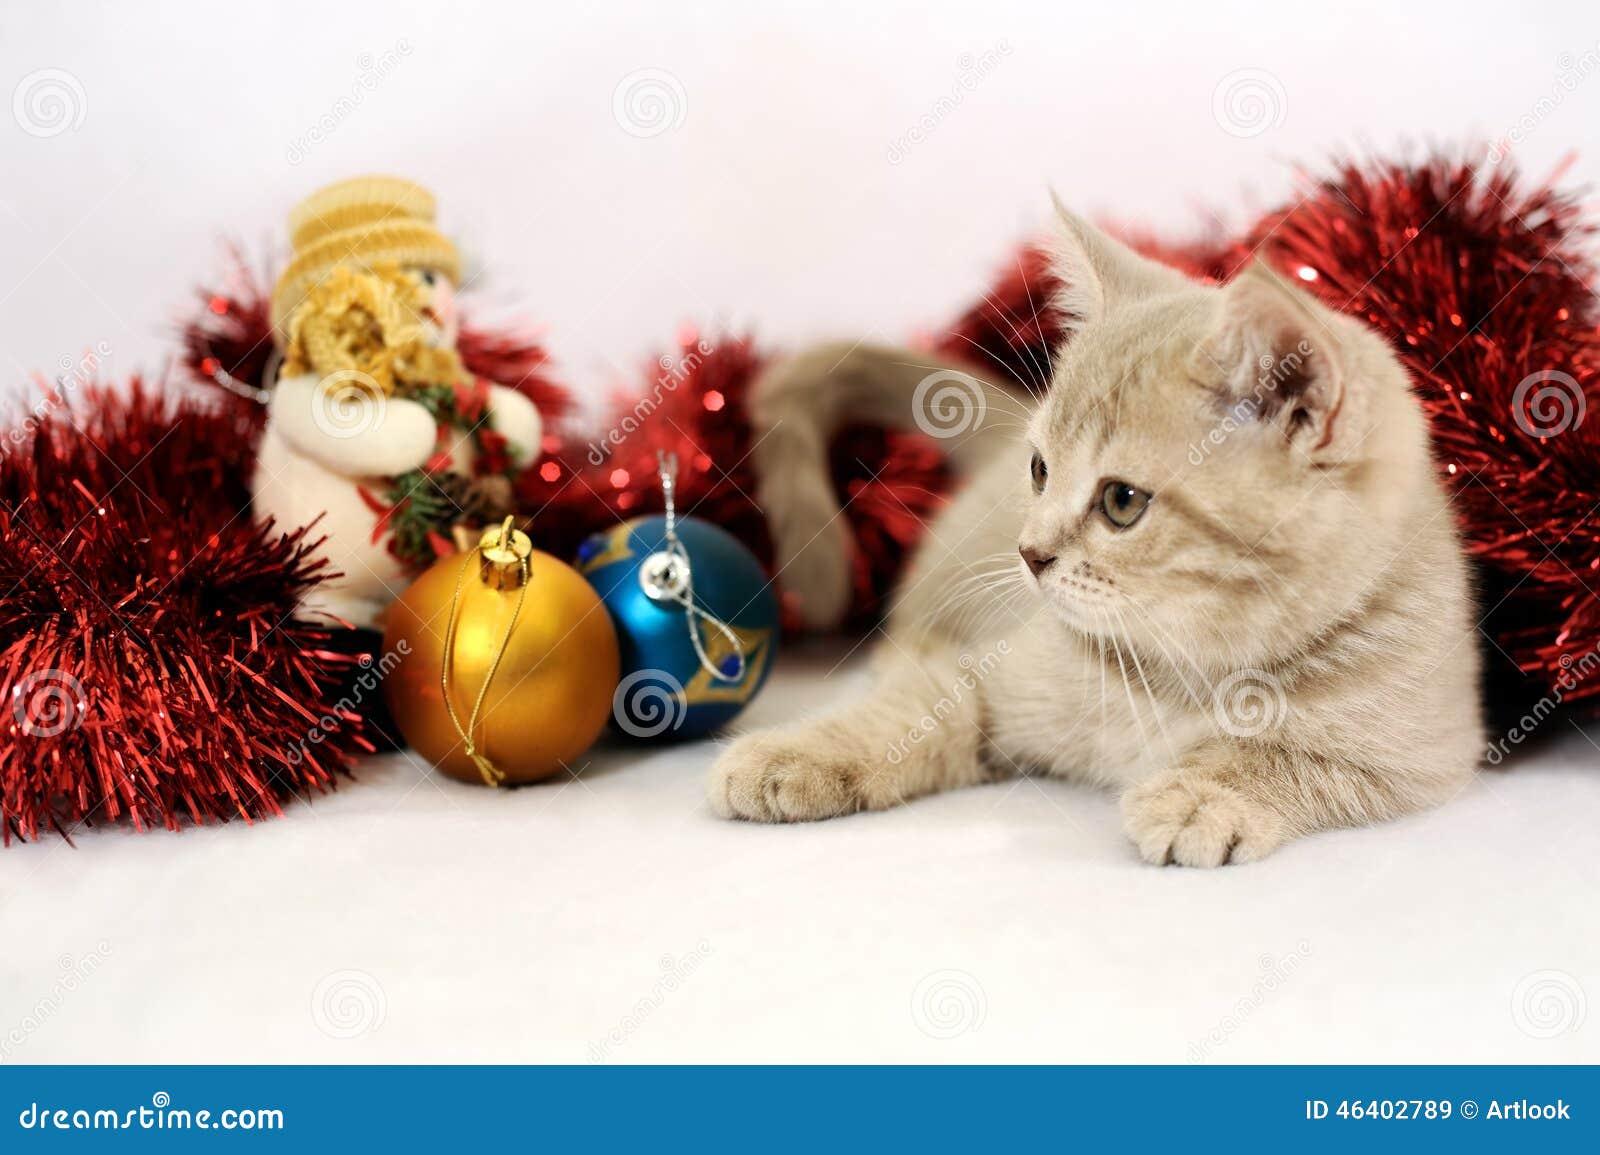 Scottish Fold Kitten & New Year Stock Image - Image of white ...